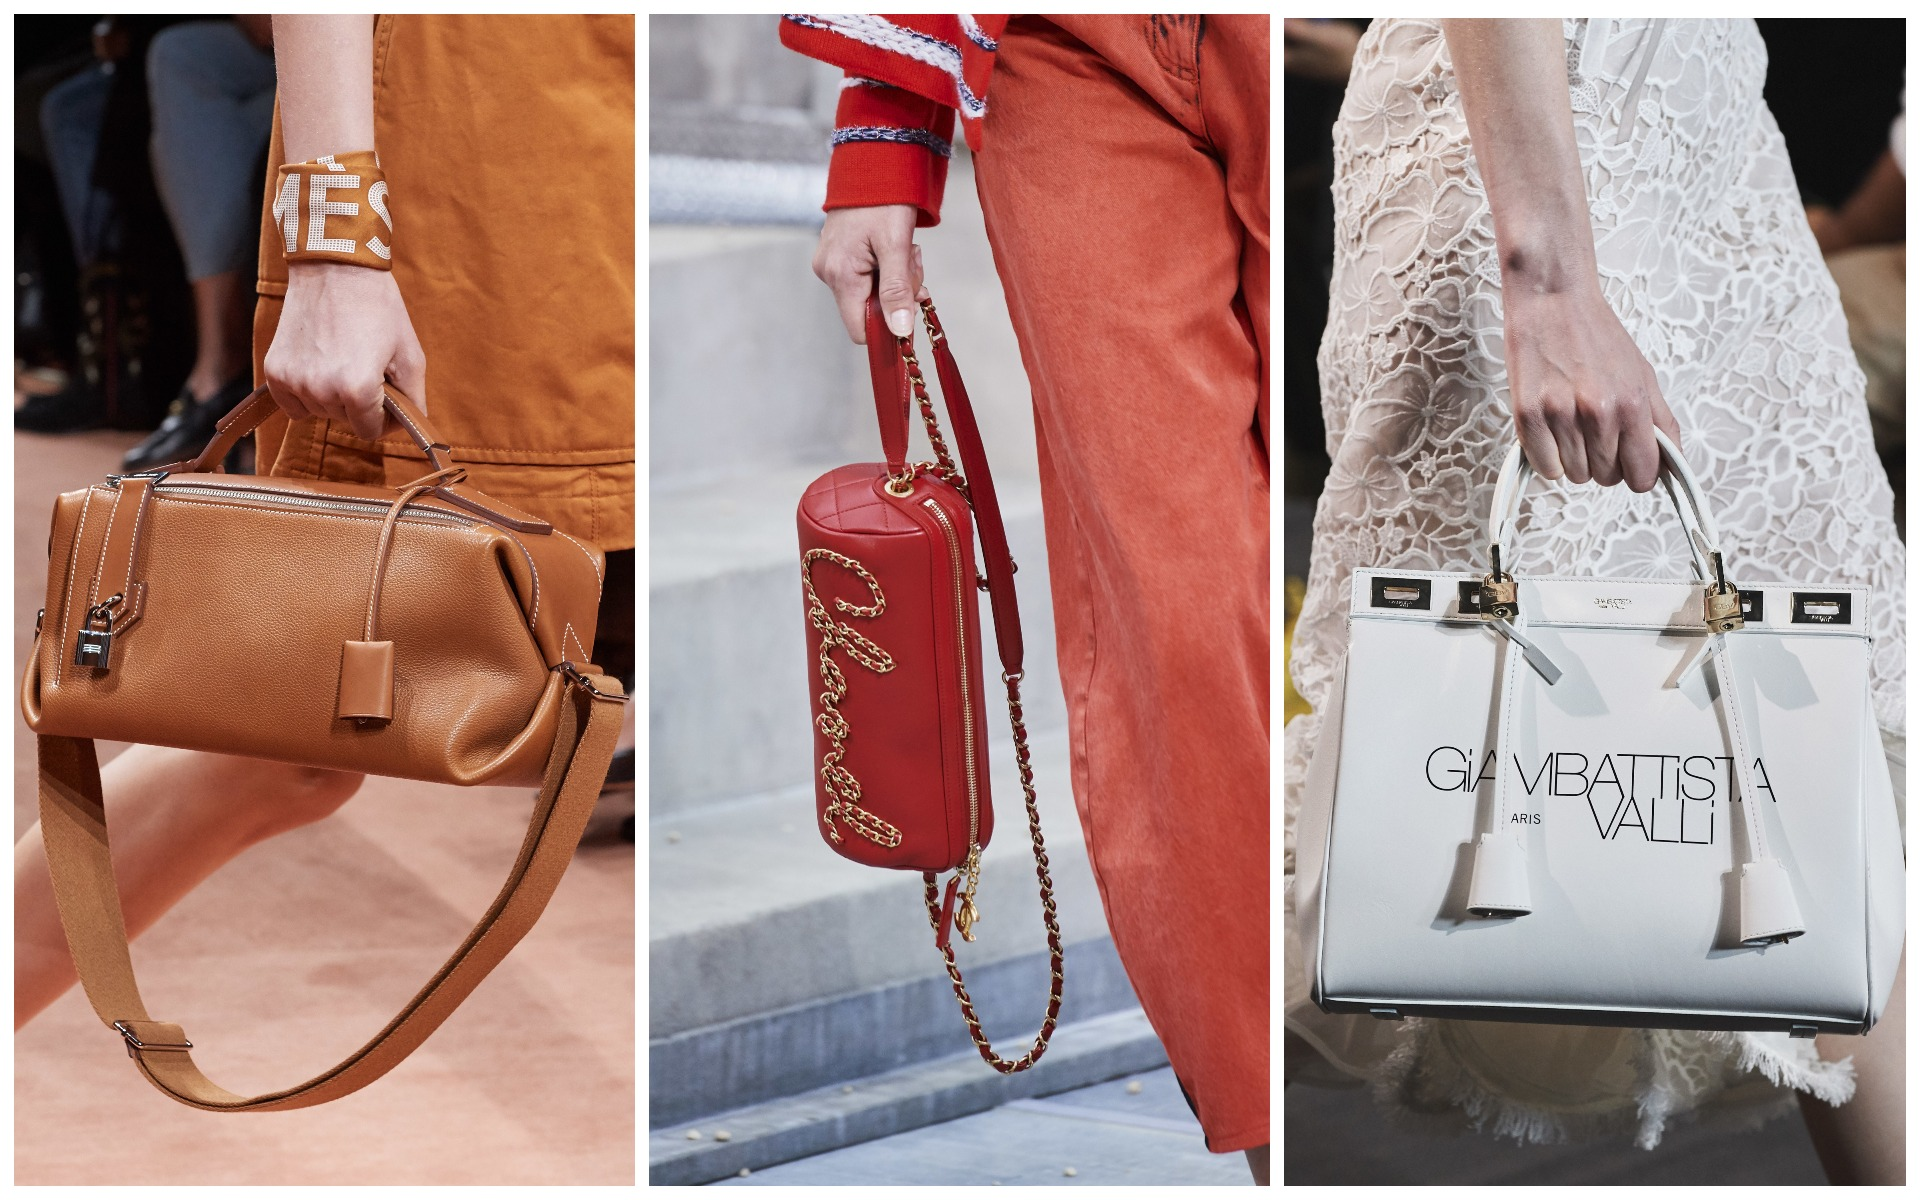 Hermes, Chanel, Giambattista Valli